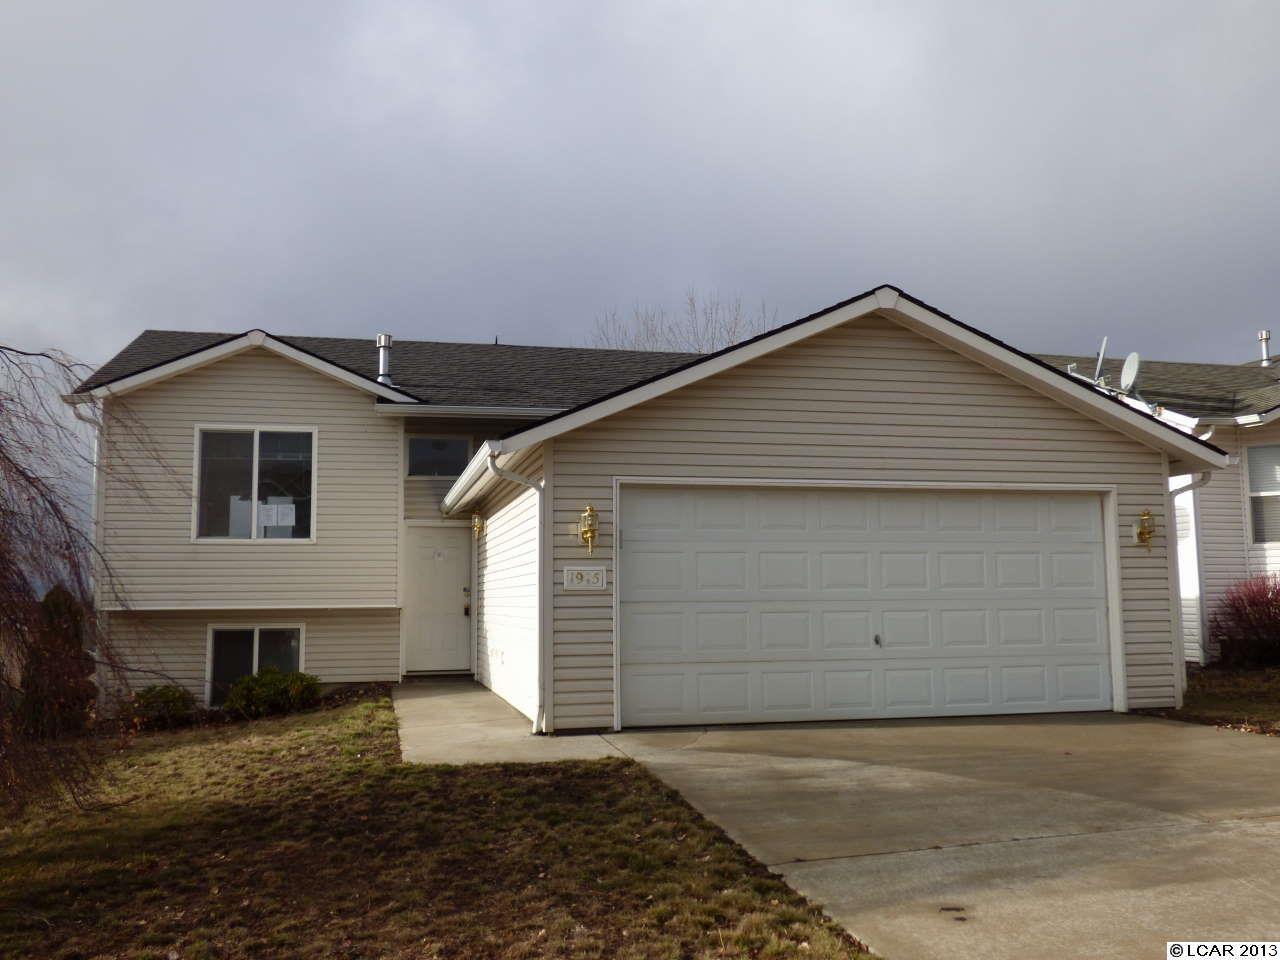 Real Estate for Sale, ListingId: 31275044, Pullman,WA99163